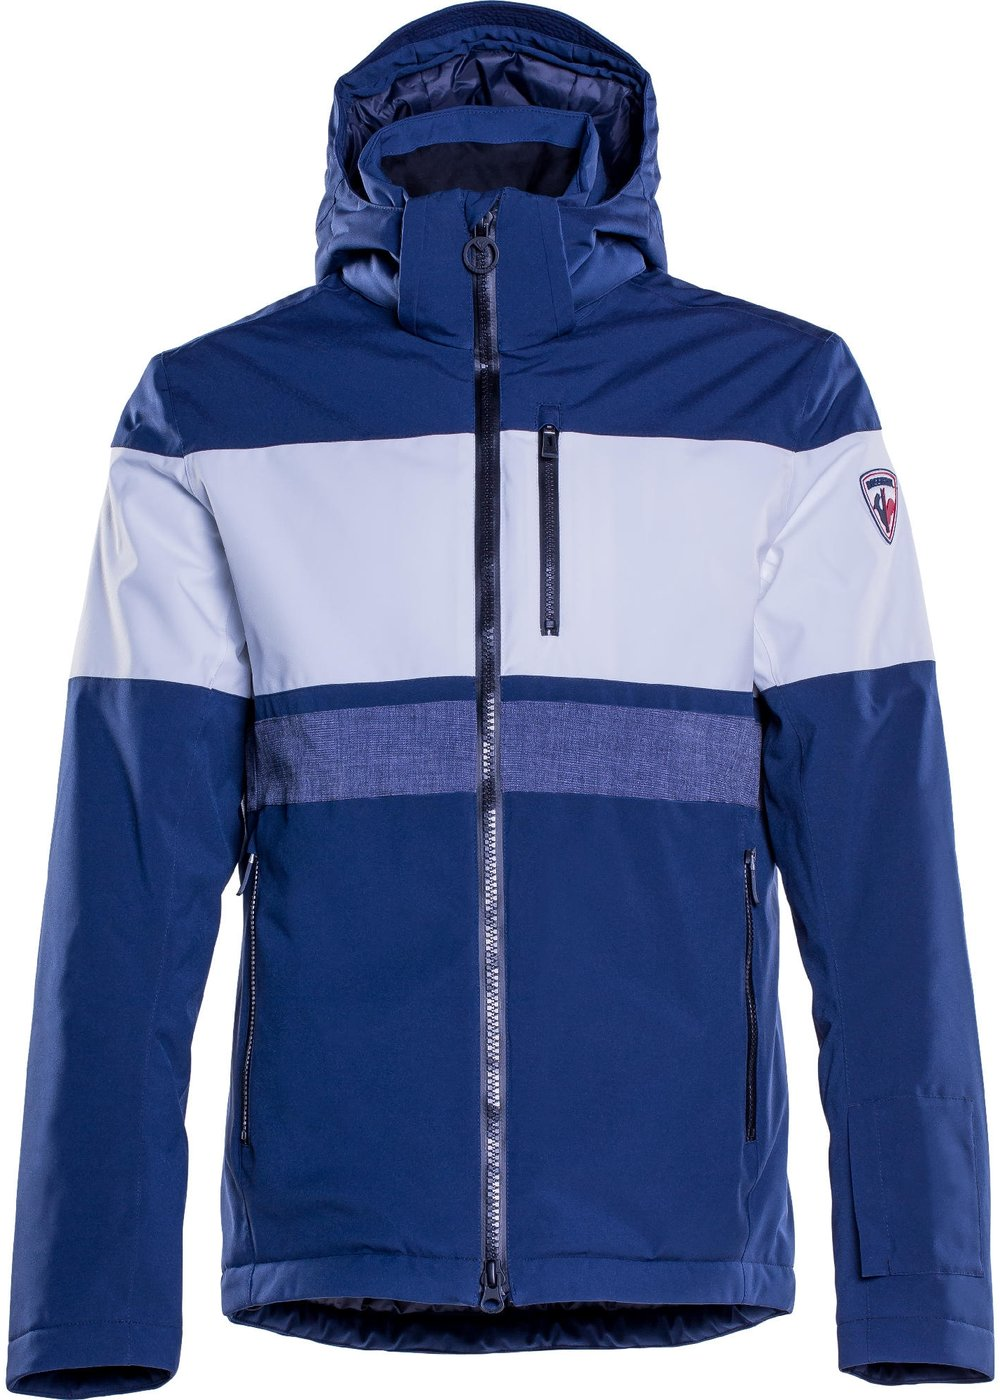 Rossignol Sideral Jacket, $700